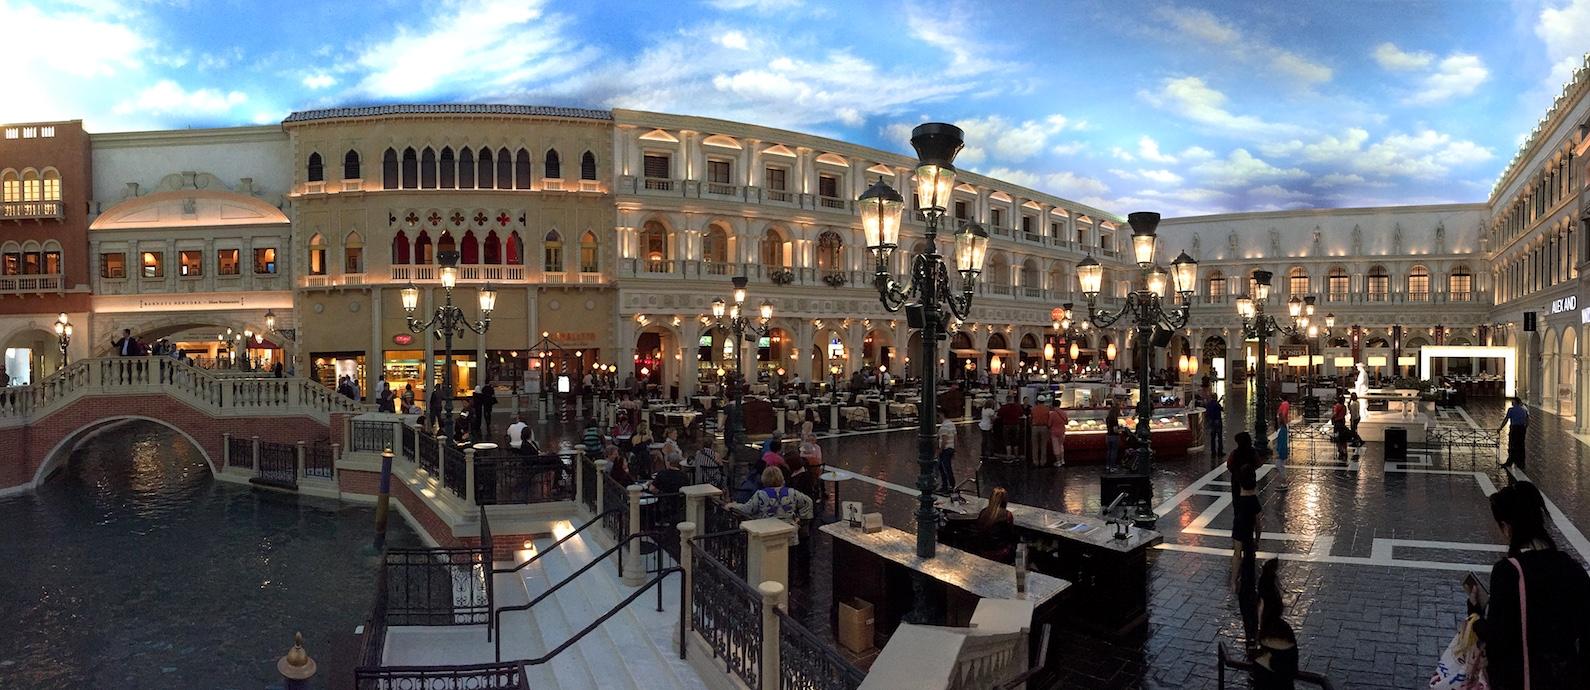 Las_Vegas_Venetian_ 09